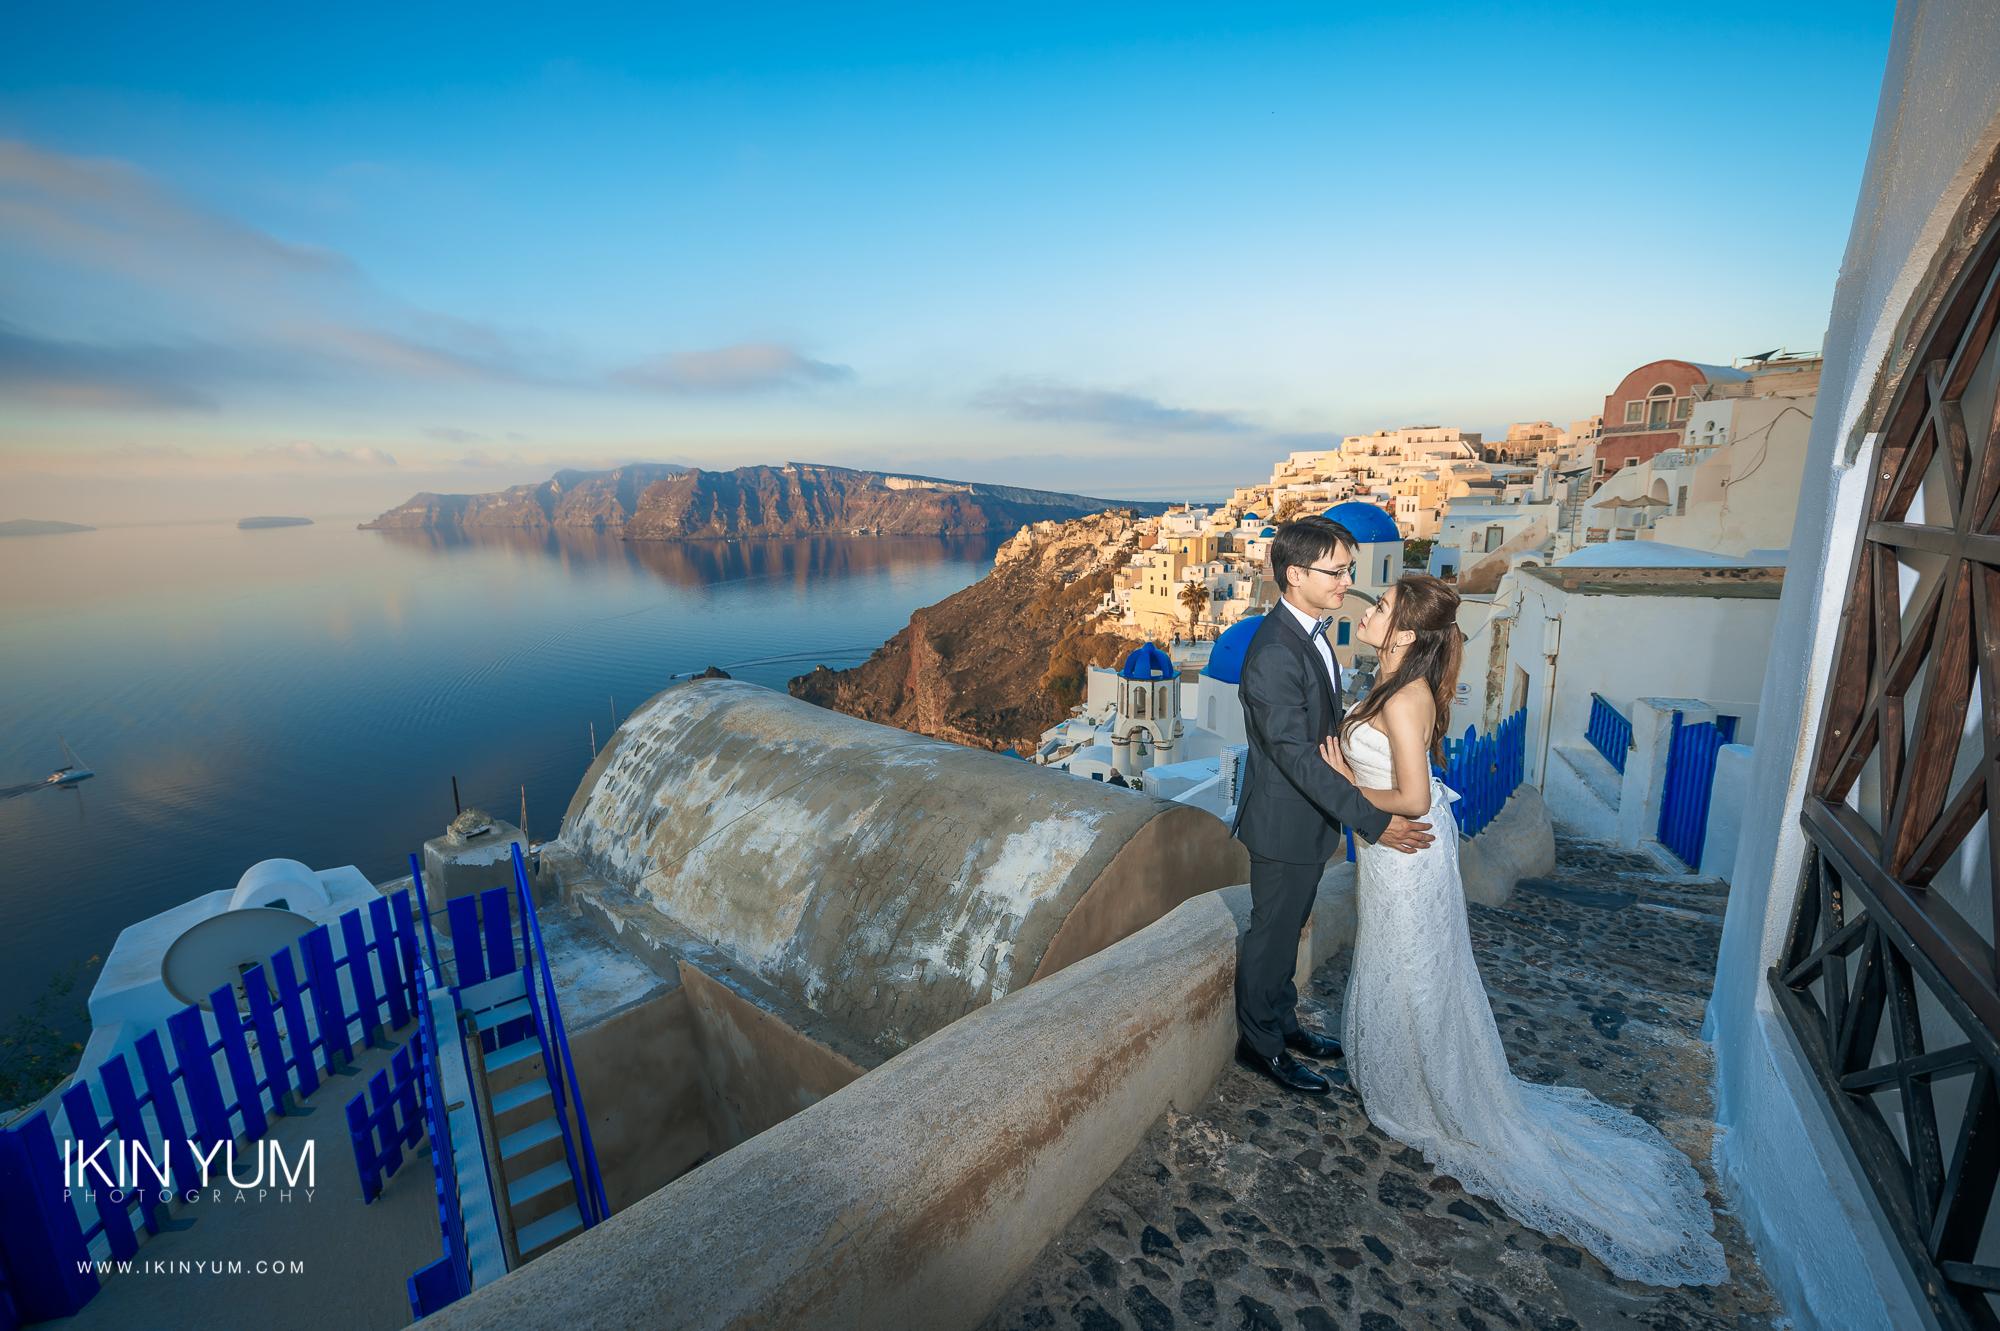 Oversea Pre-Wedding Shoot - London Pre-Wedding Photographer - 英国伦敦婚纱摄影